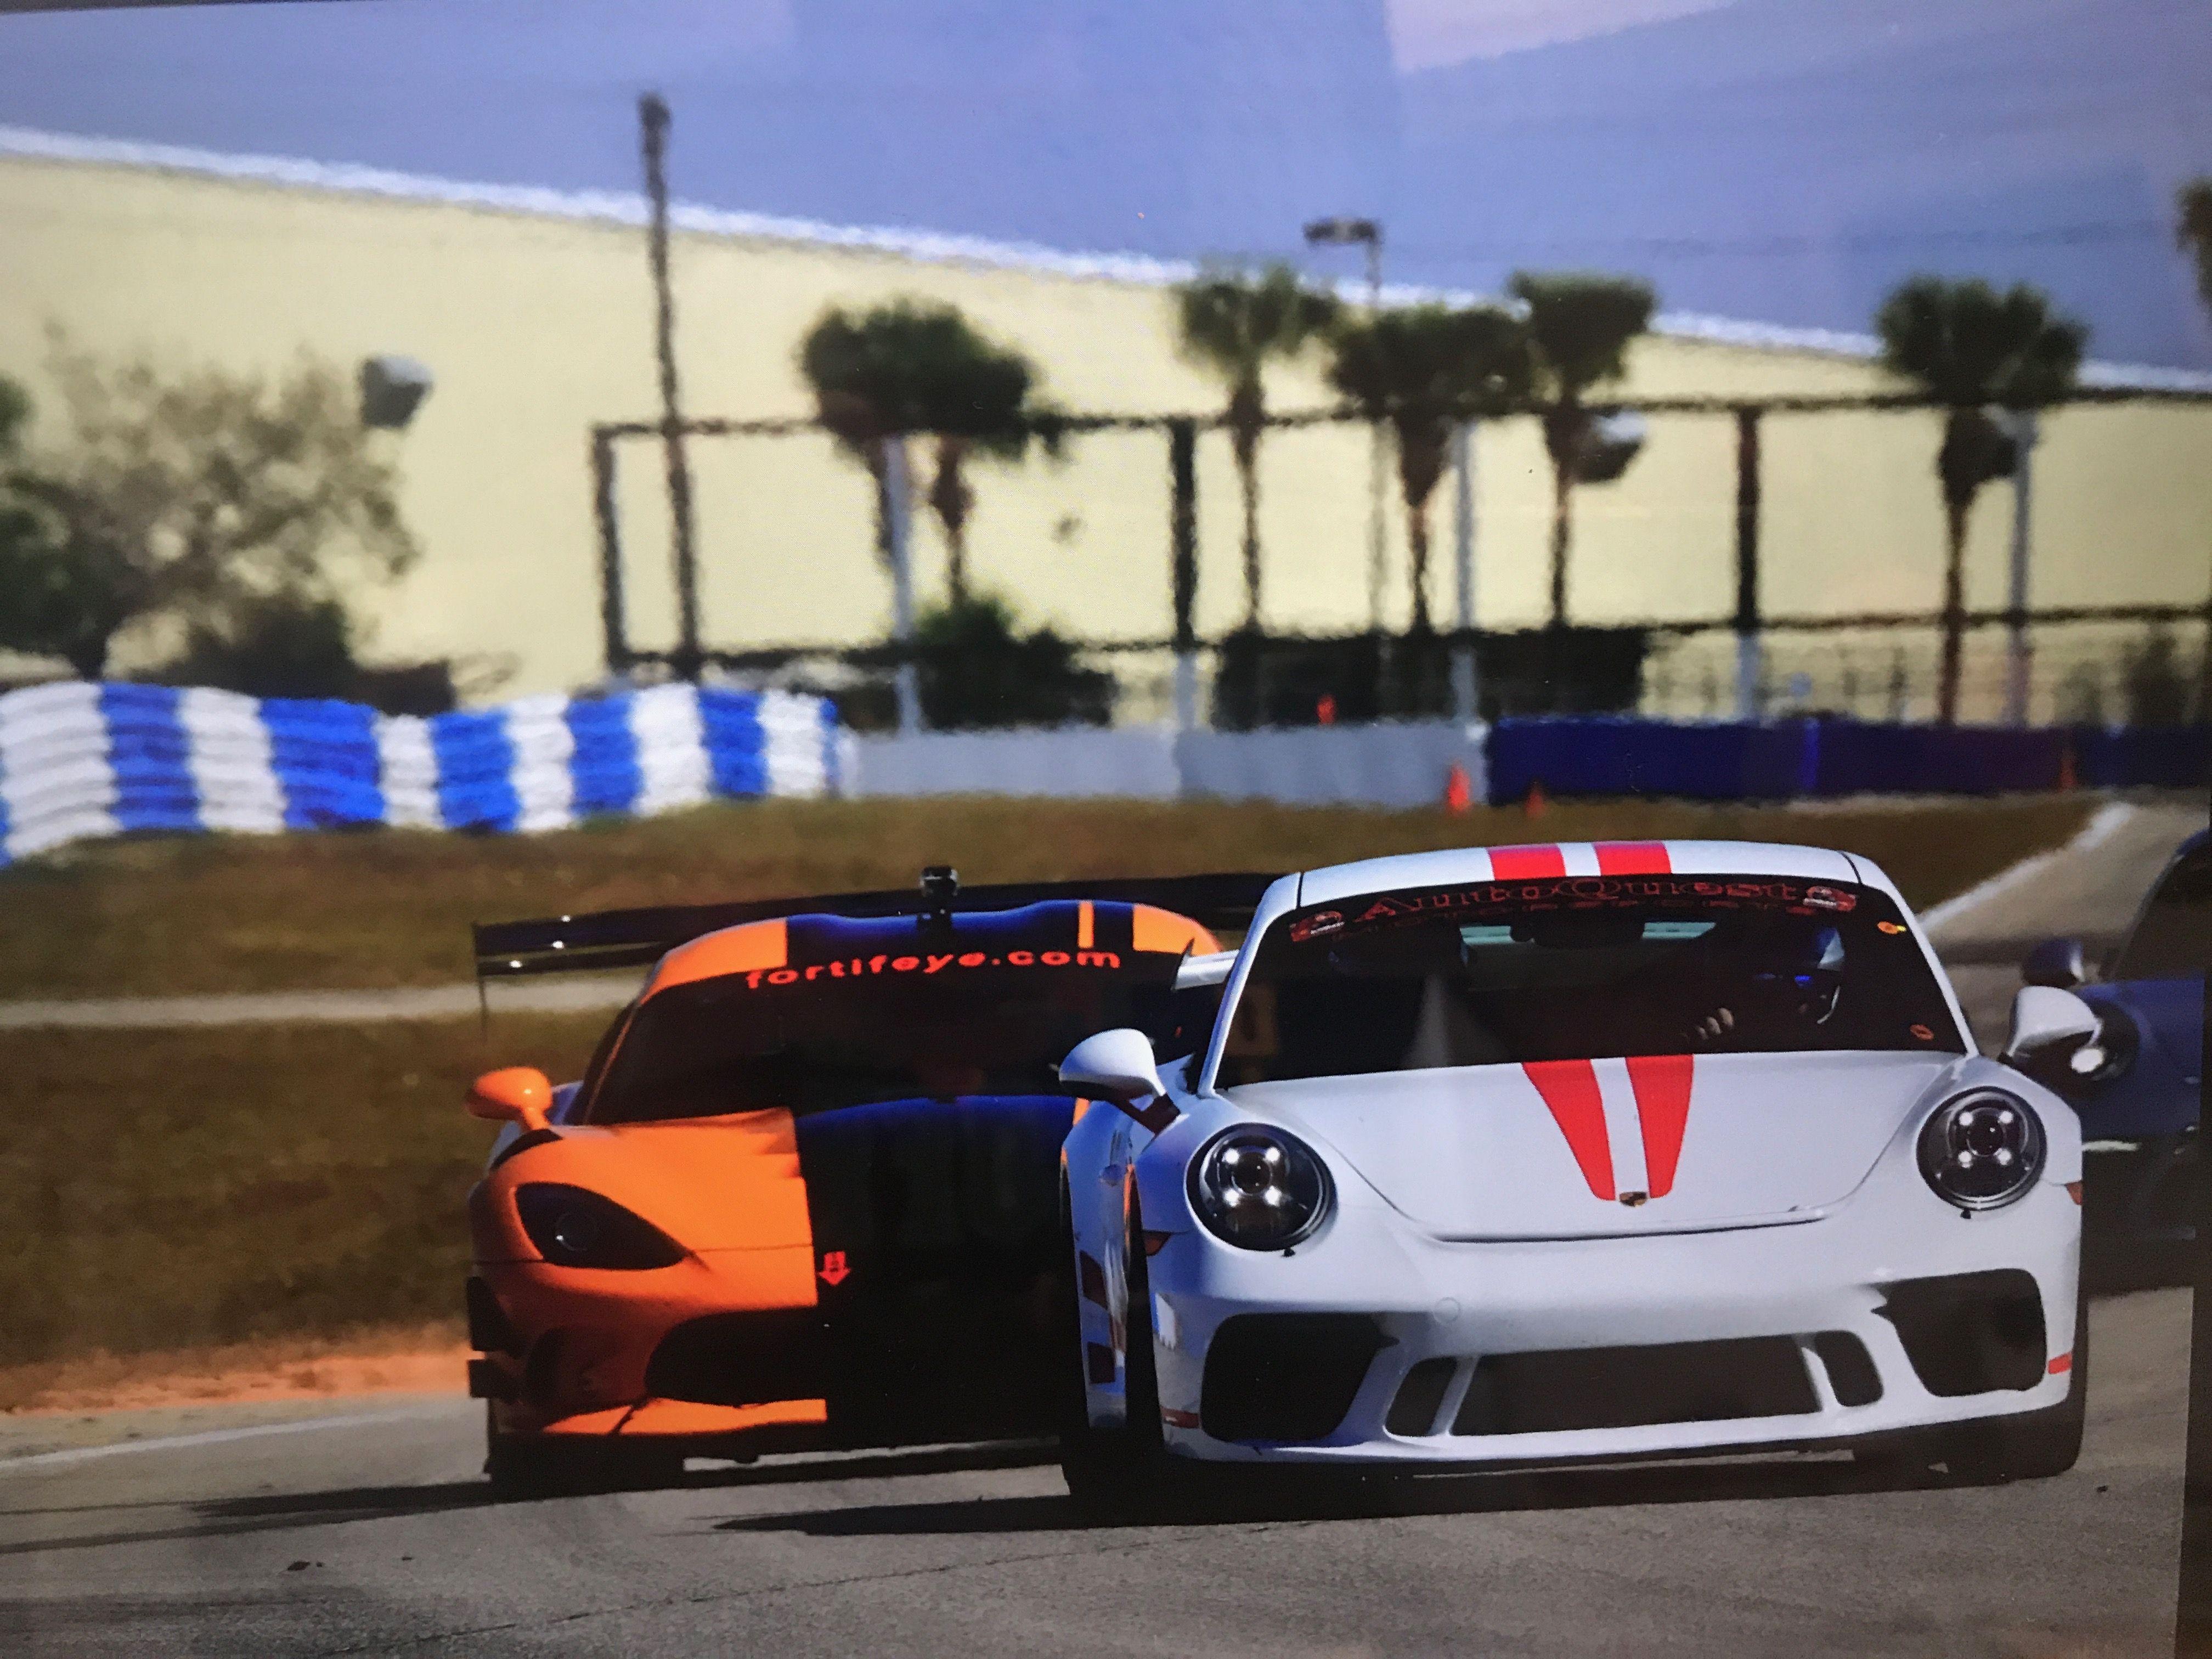 Dr Michael P Lange In Fortifeye Orange Viper Preparing To Pass Porsche Gt3 At Sebring Raceways Dr Michael Lange Ocala Sebring Raceway Race Cars Porsche Gt3